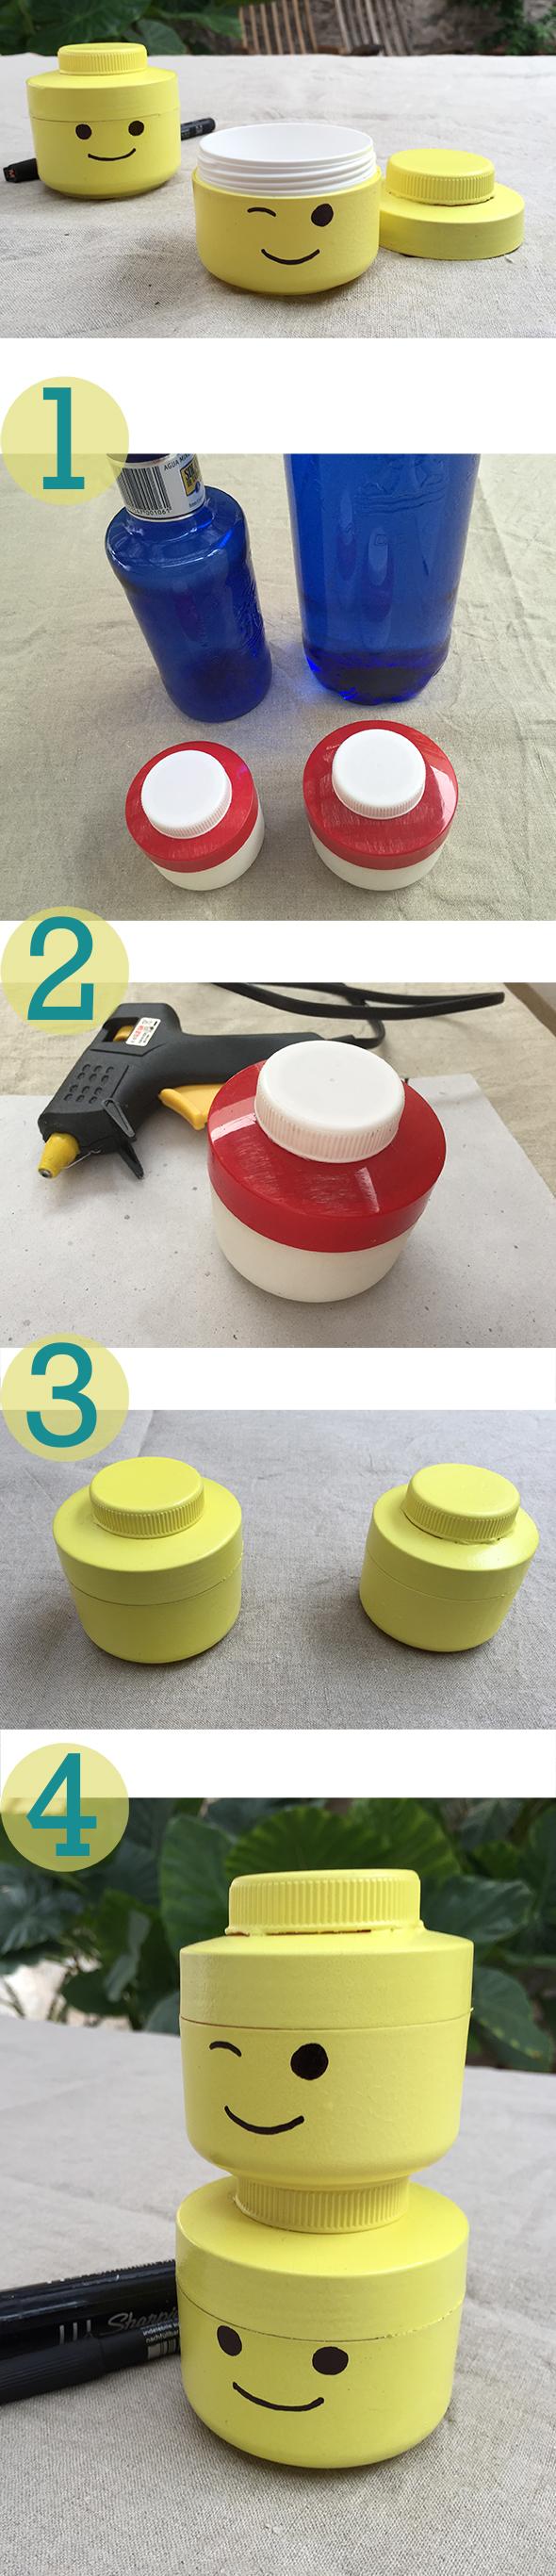 lego kopf recycling basteln manualidad craft